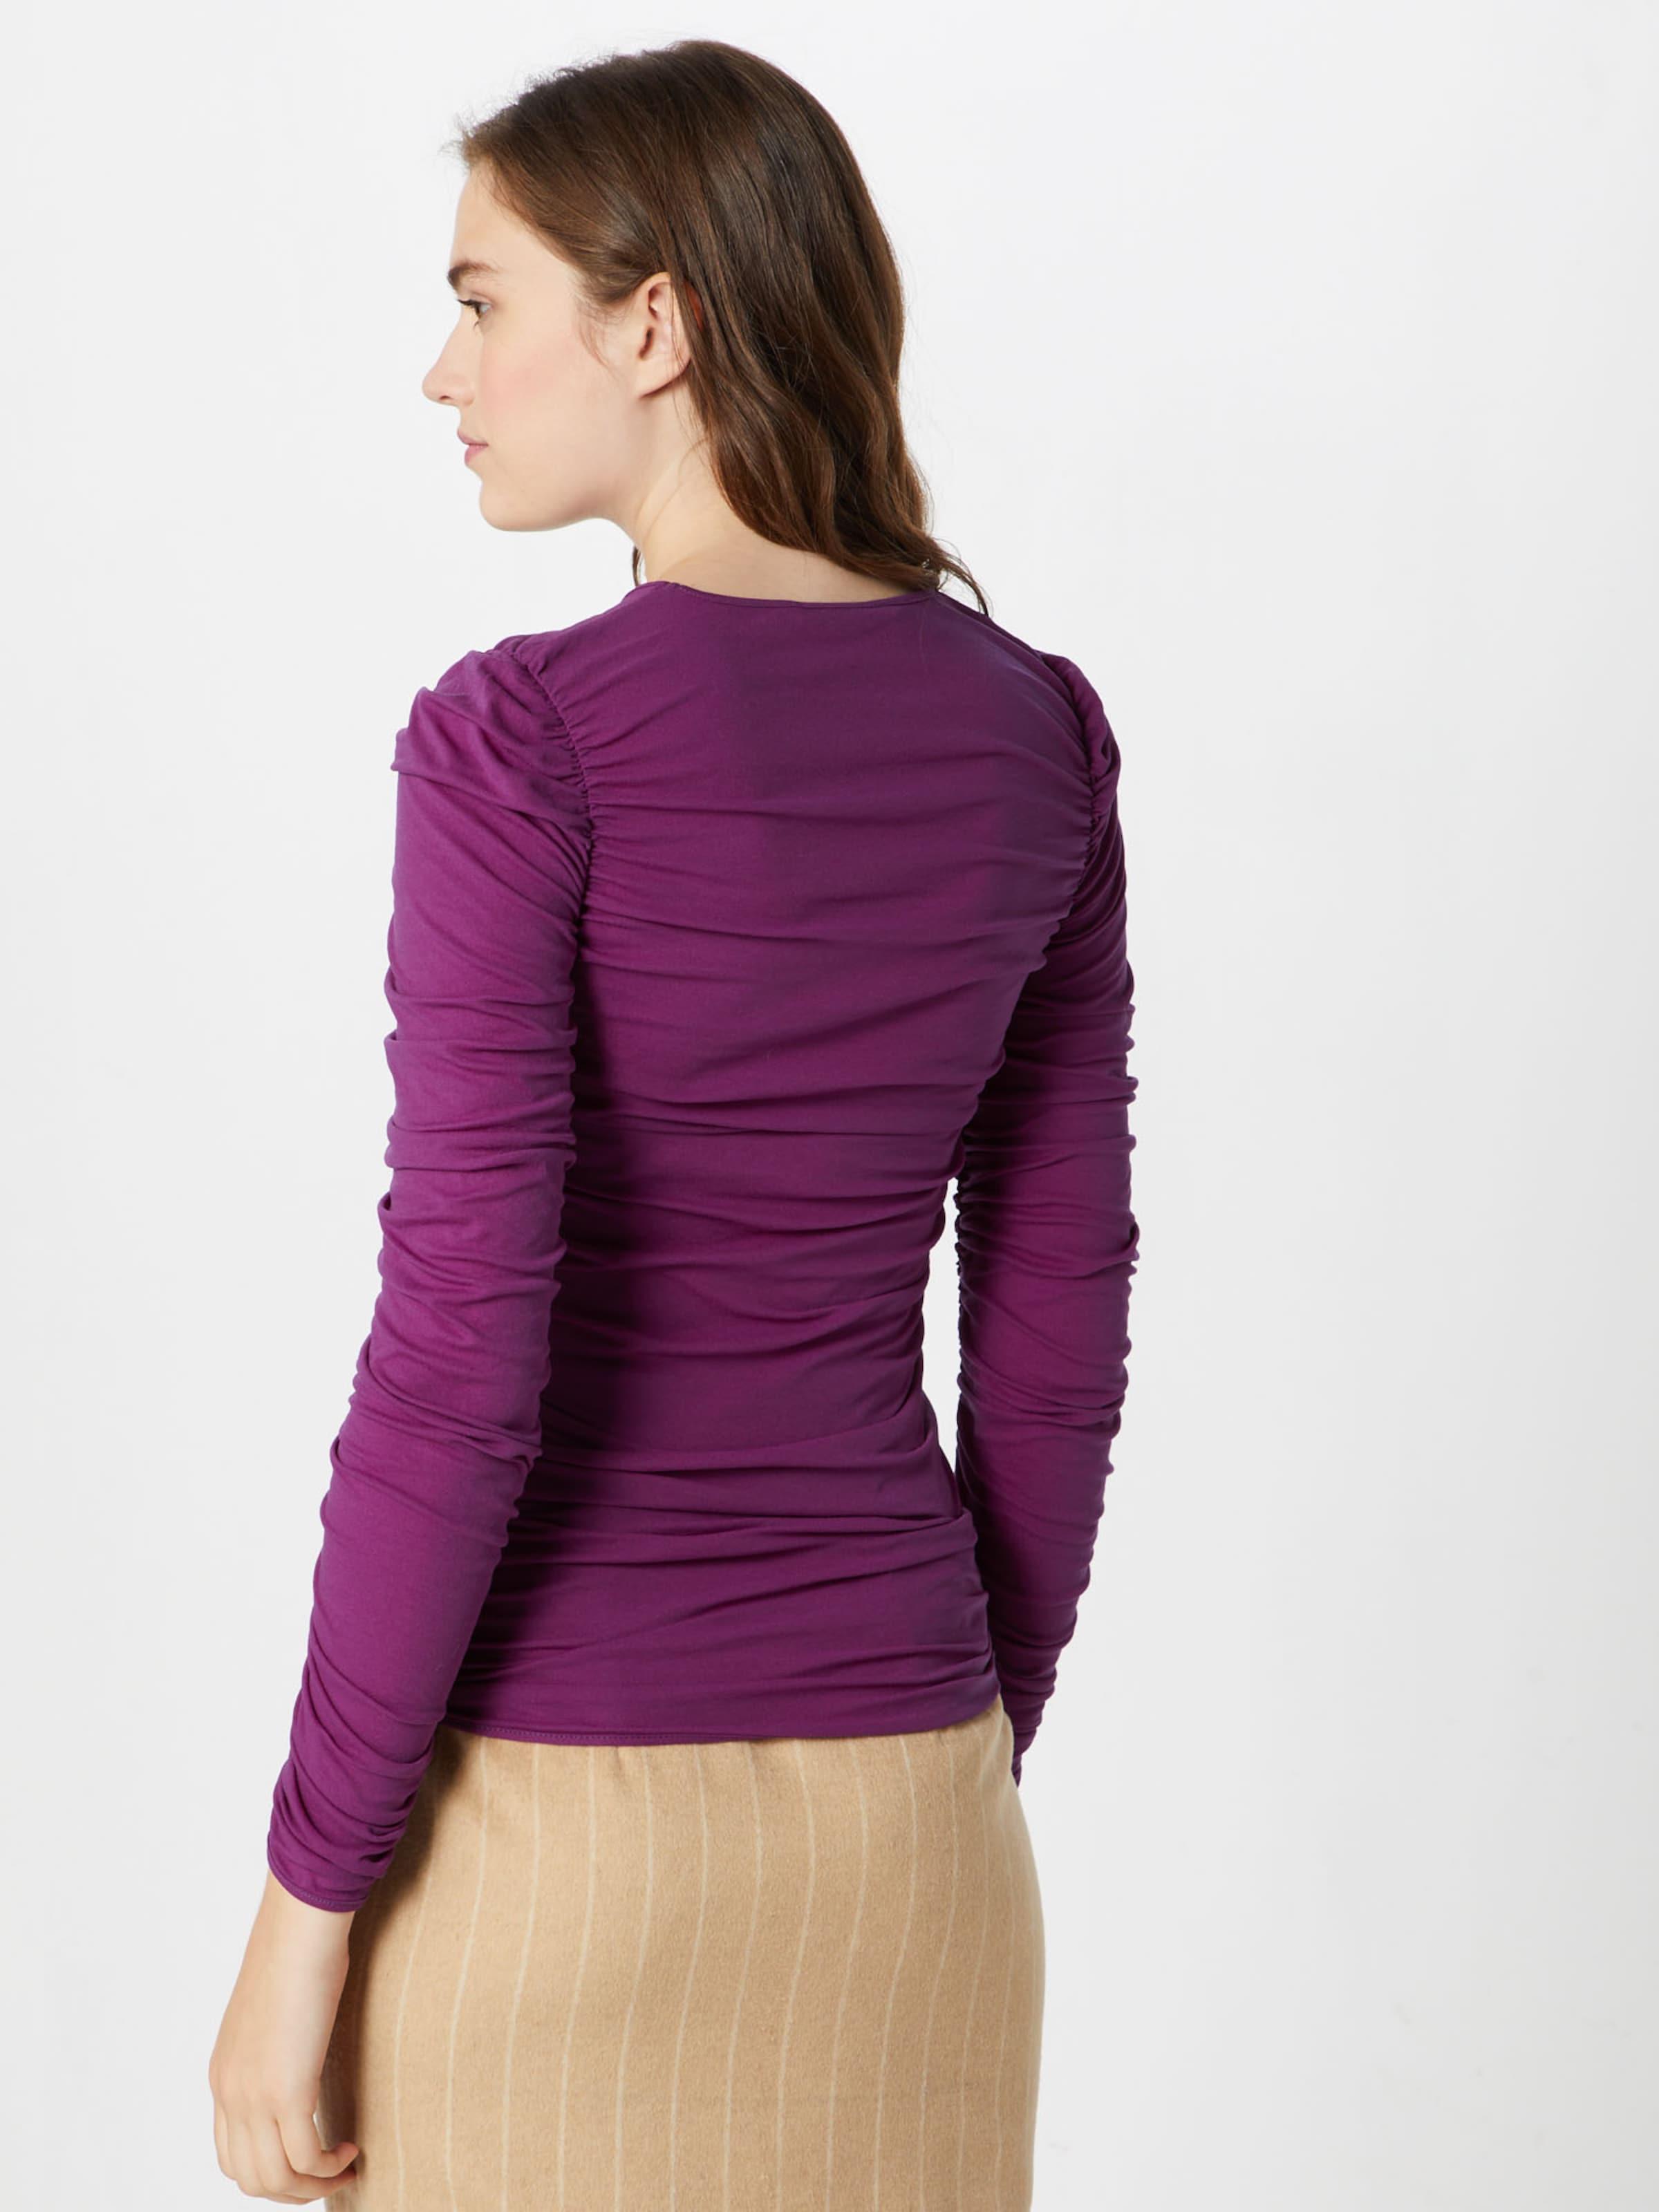 Postyr Lila Ls 'poskrusemynte In Shirt Tee' rtQsChd